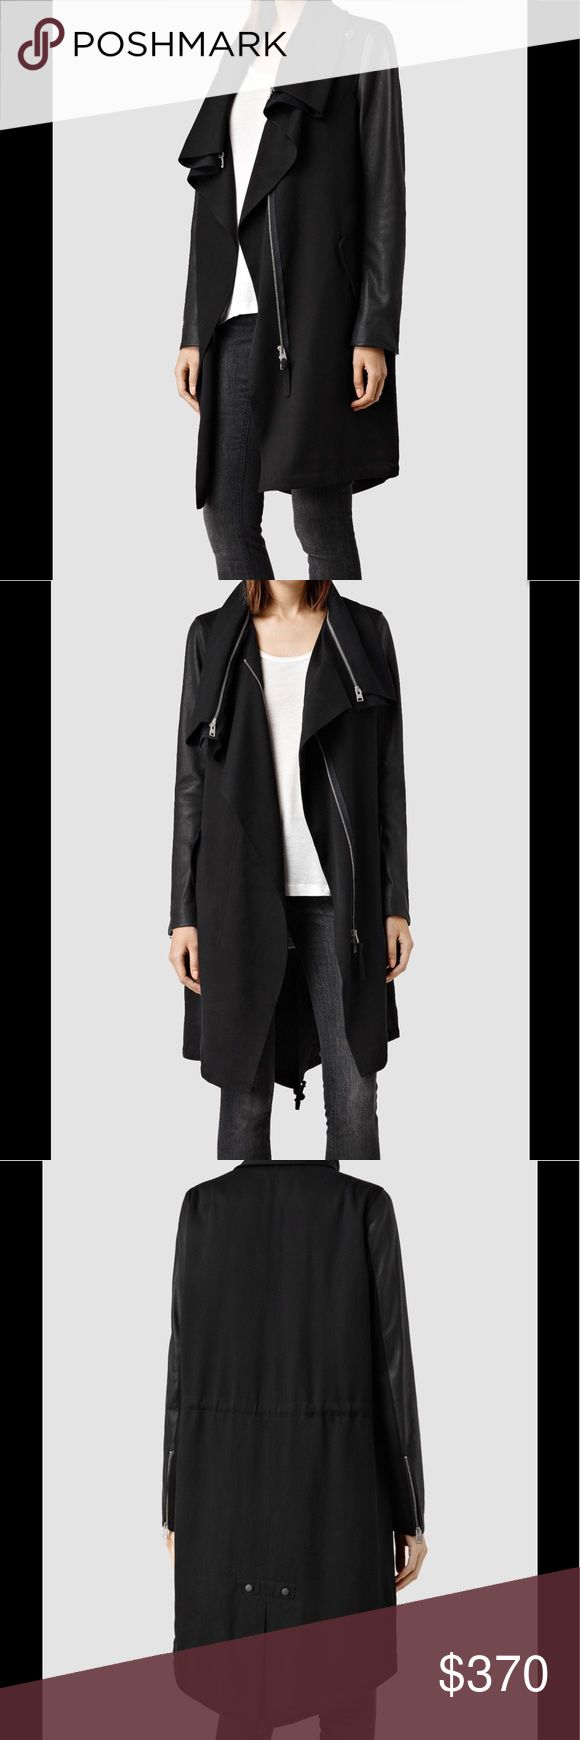 All Saints Luna parka size US 6 This is the gorgeous All Saints Luna Parka Jacket coat Black Gorgeous versatile coat !  100% Lamb leather sleeves. All Saints Jackets & Coats